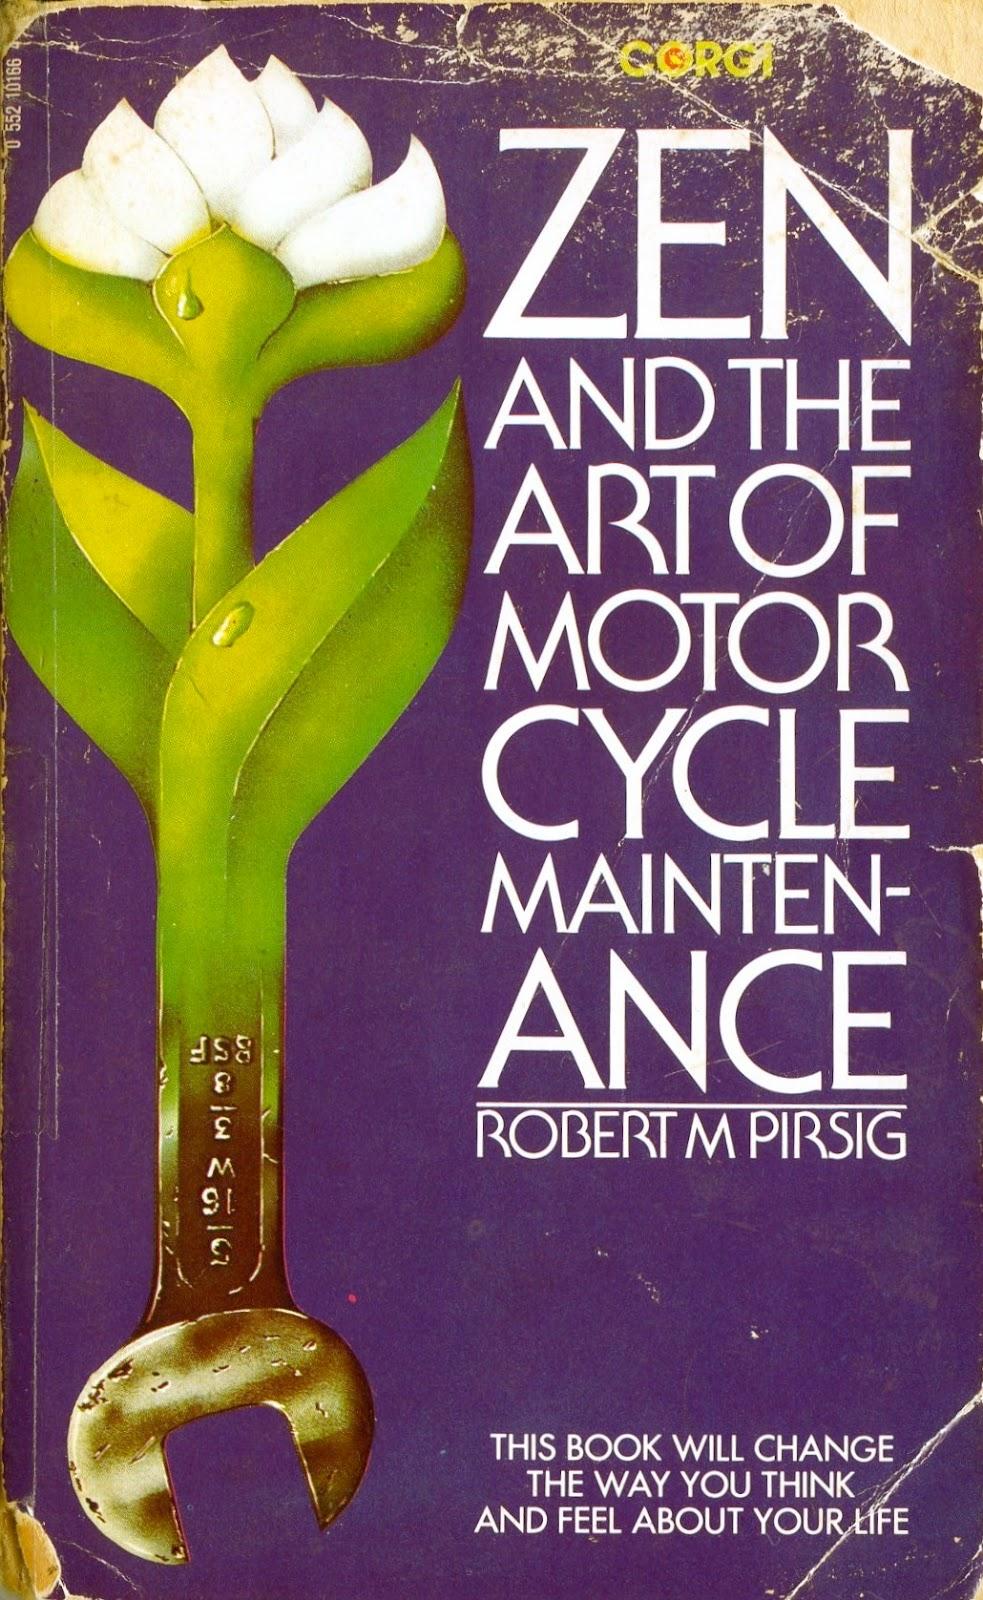 Zen and the Art of Motorcycle Maintenance, Robert M. Pirsig